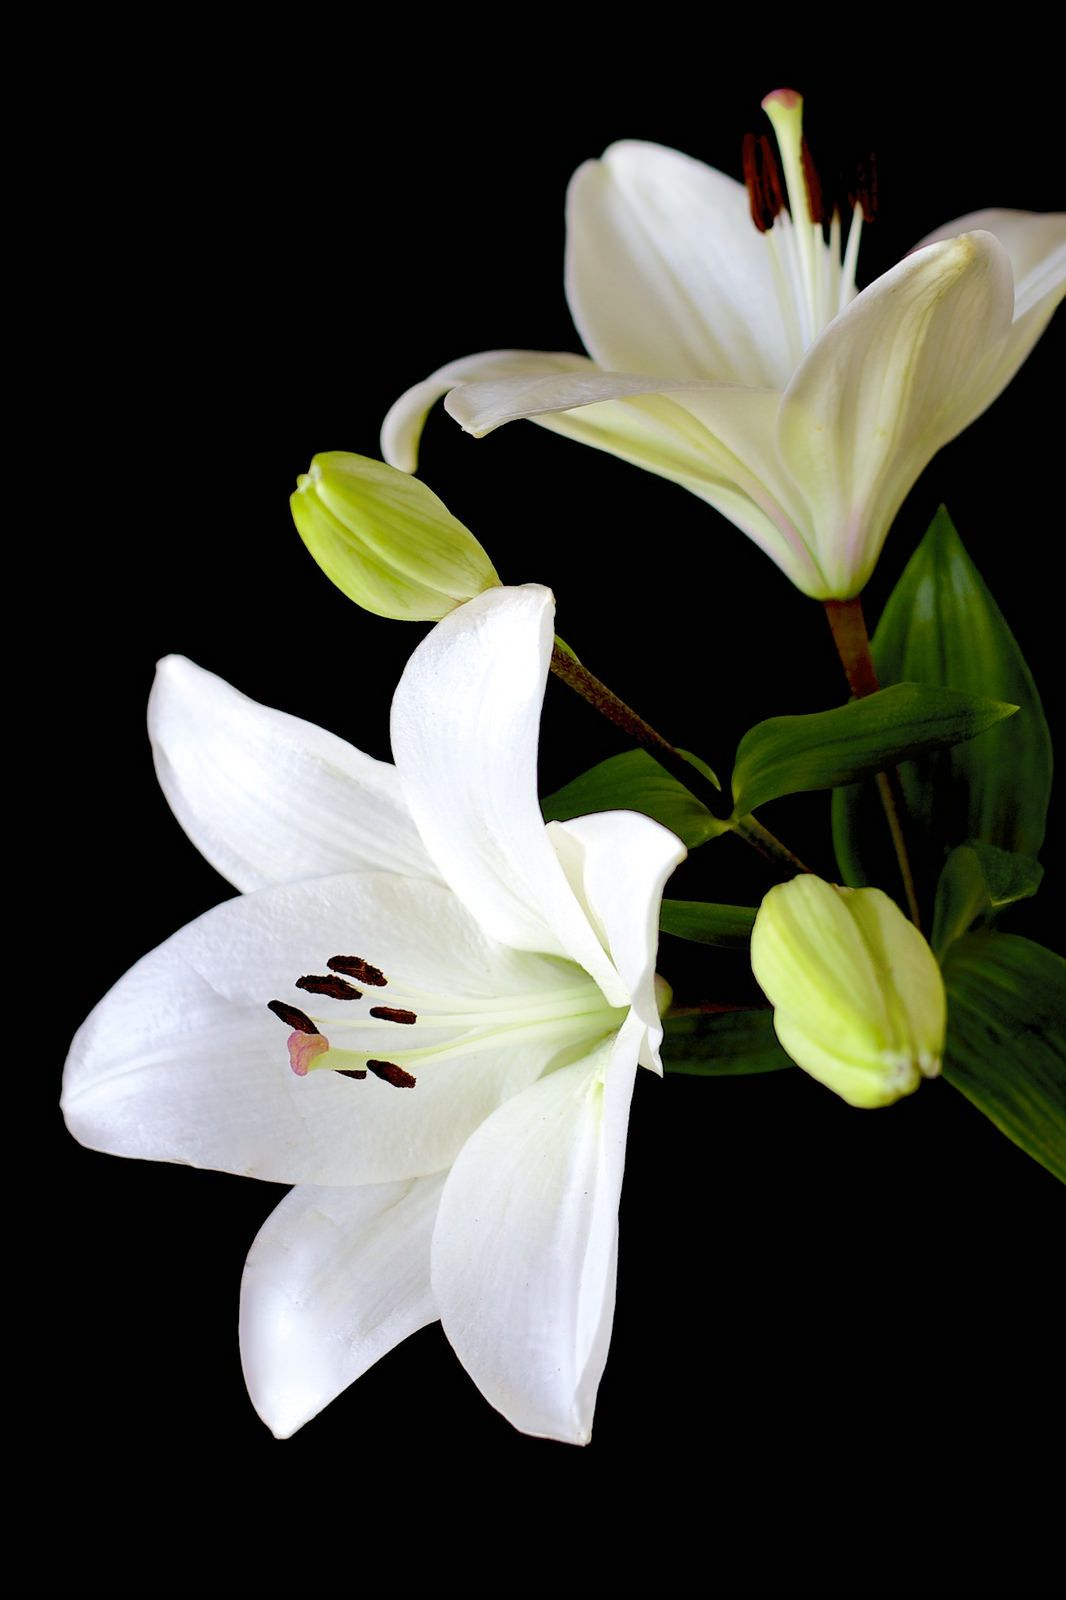 Lily on black by henrietta oke flowers pinterest photos by